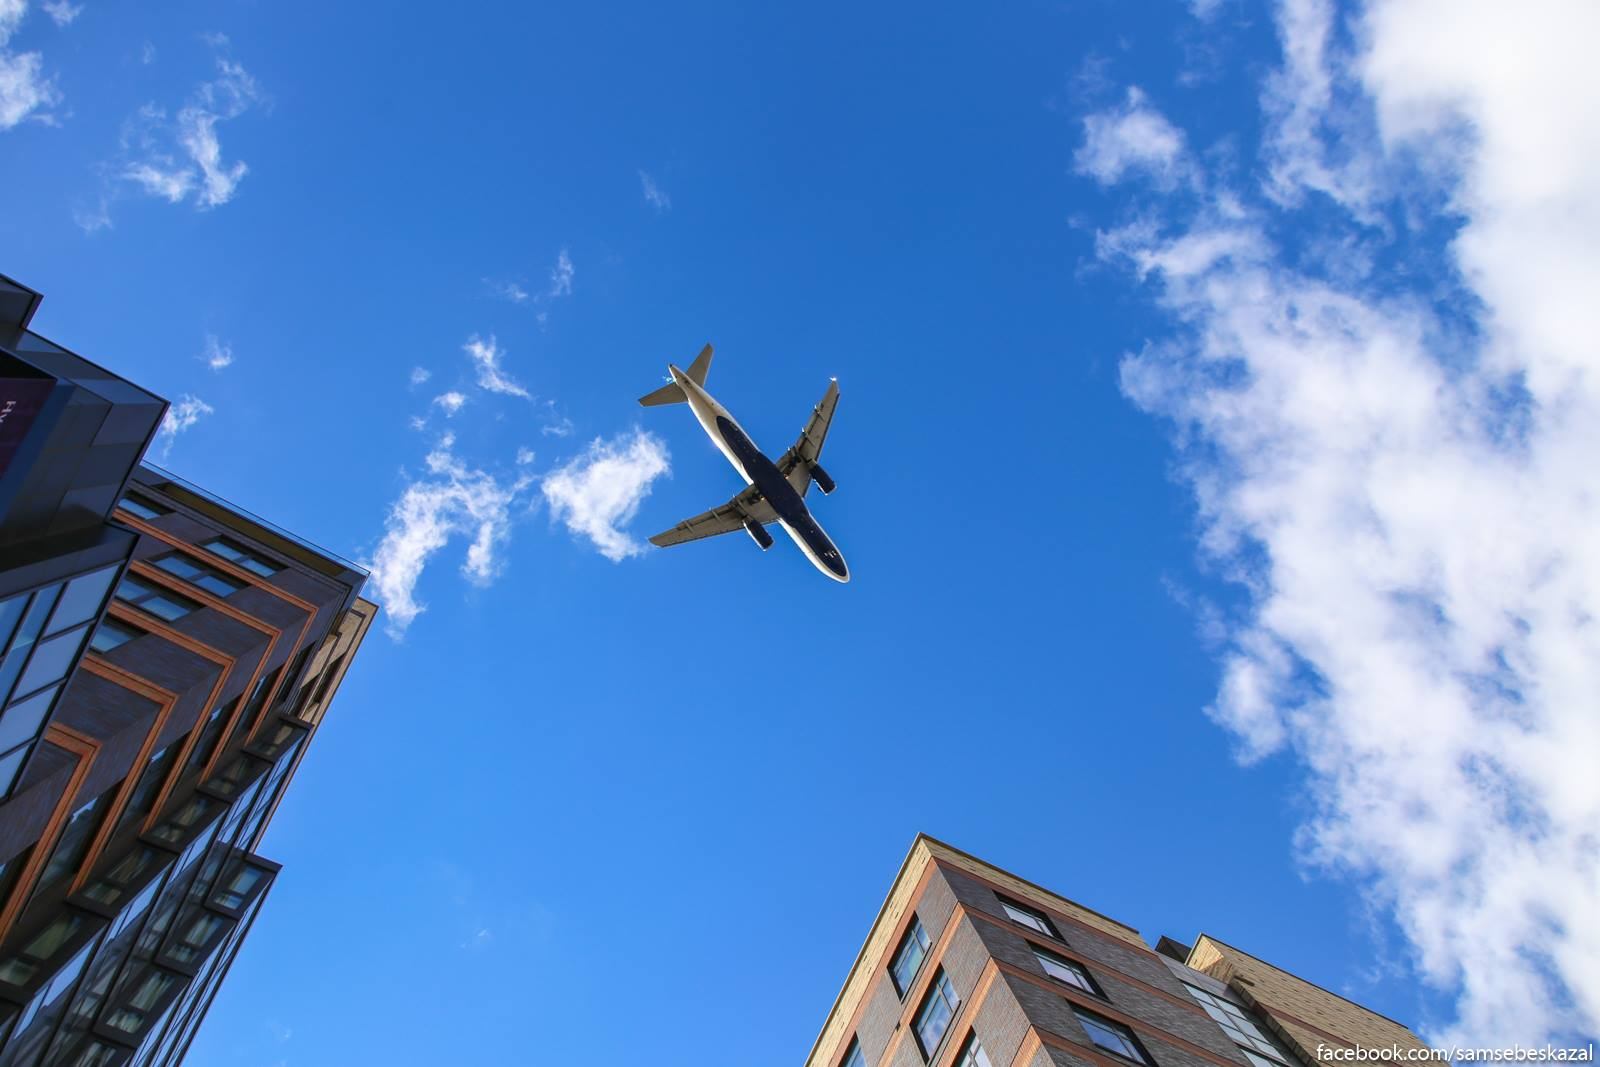 A ese samolety pramo nad golovoj letaut.